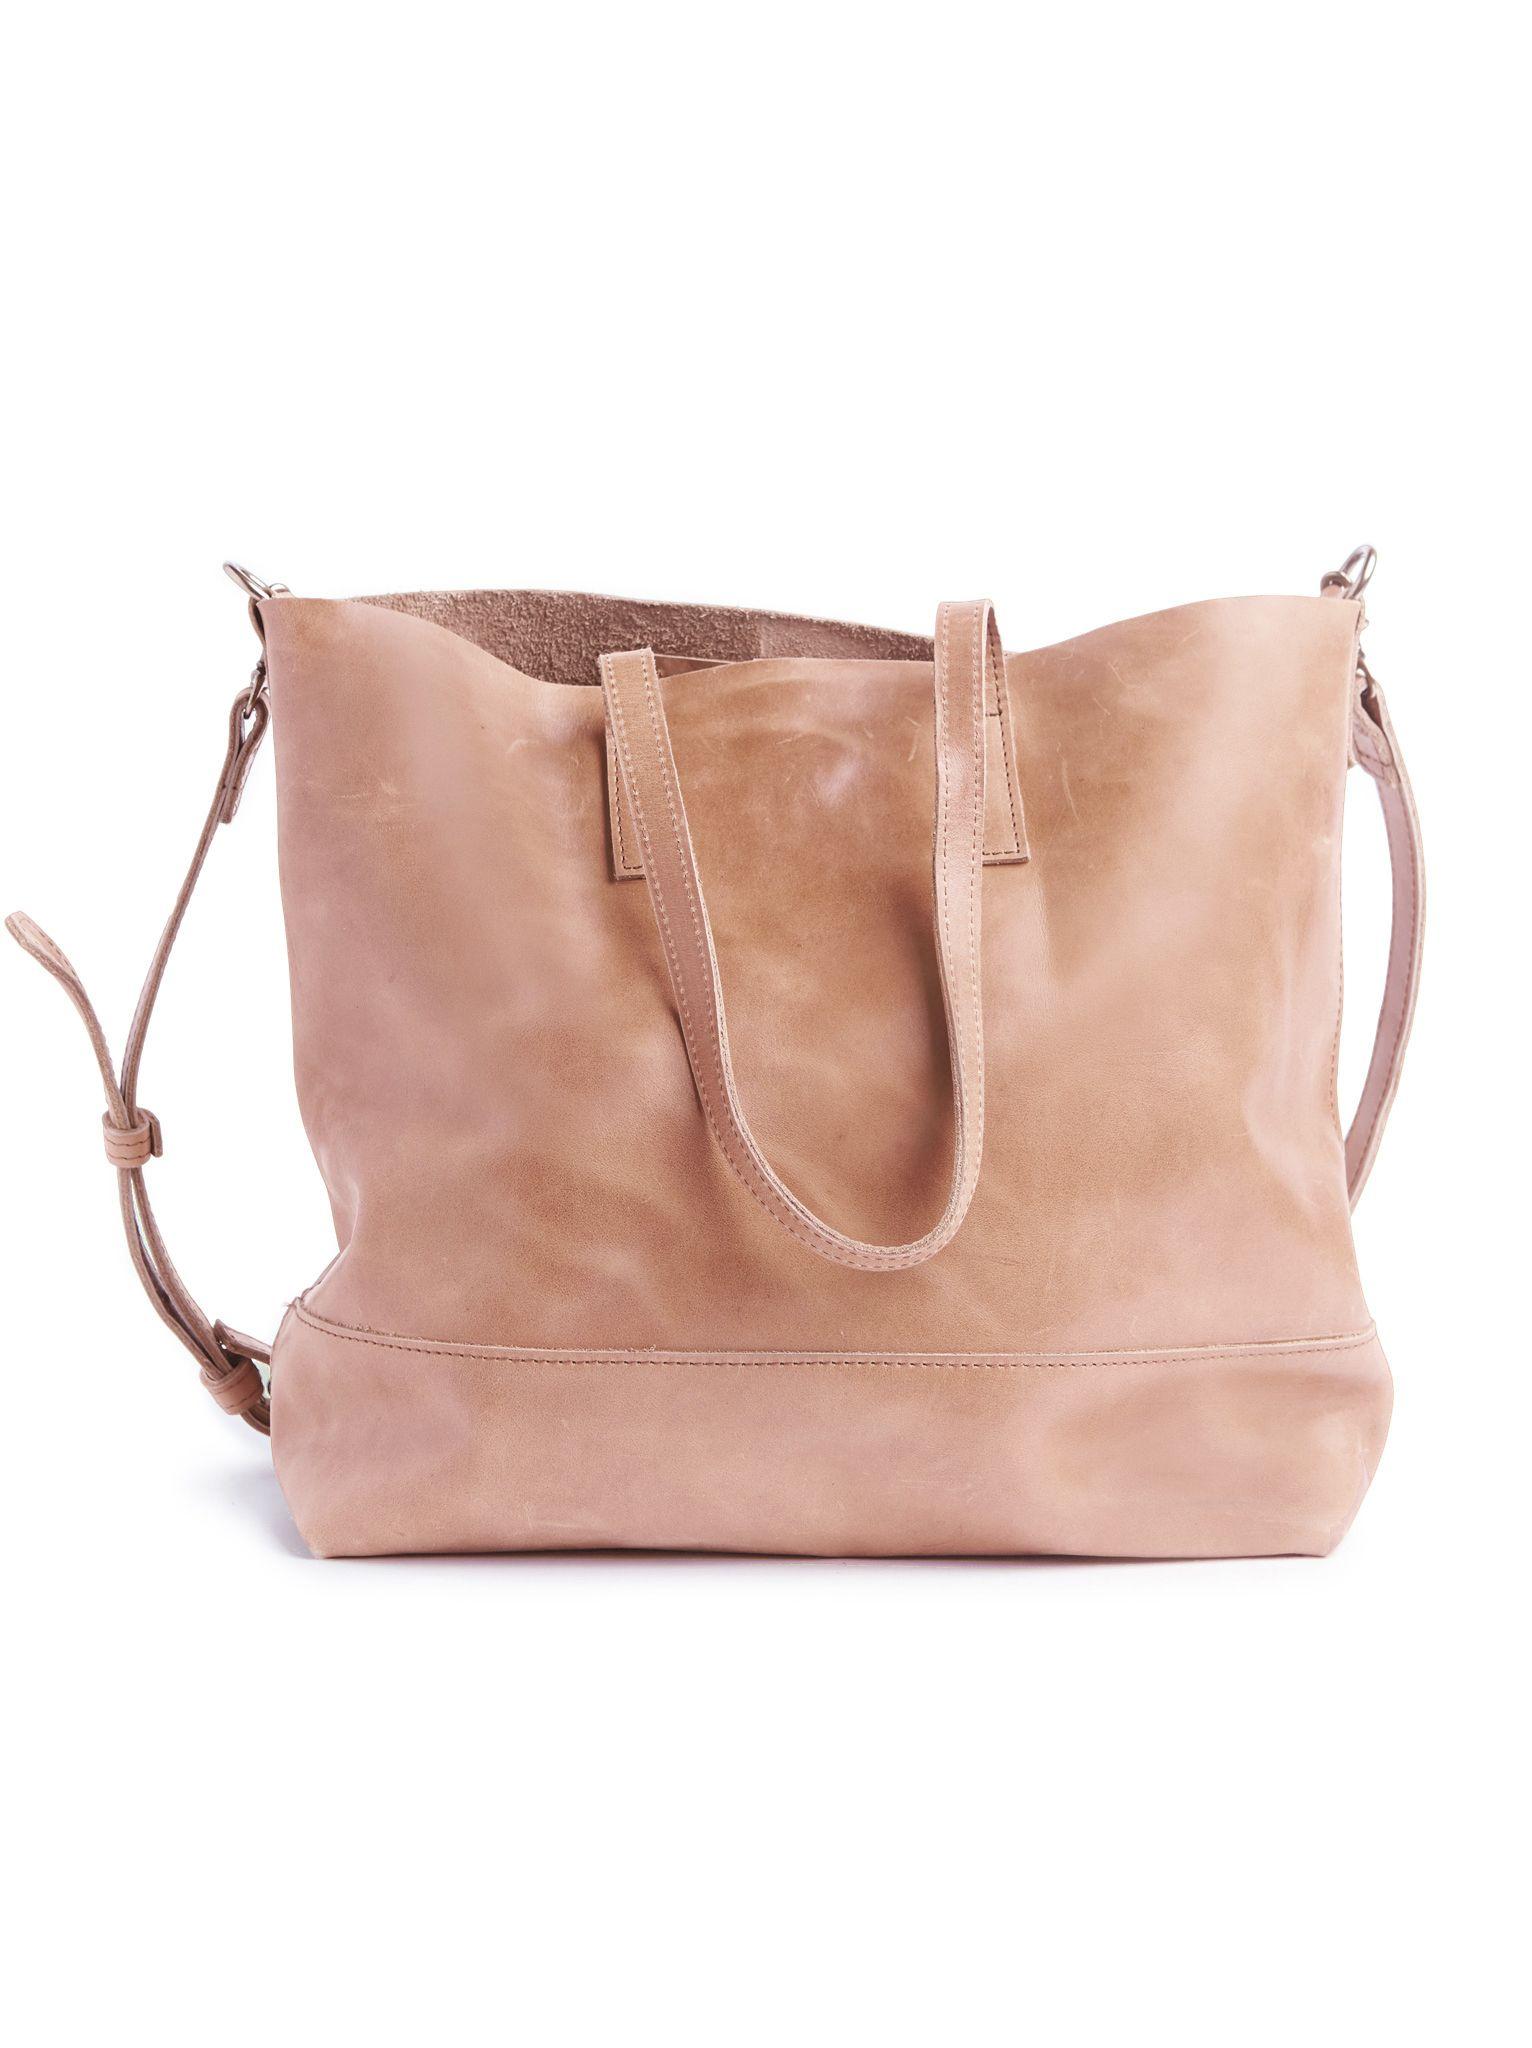 f09505eb8b05 Abera Crossbody Tote | Bags | Crossbody tote, Pink tote bags ...